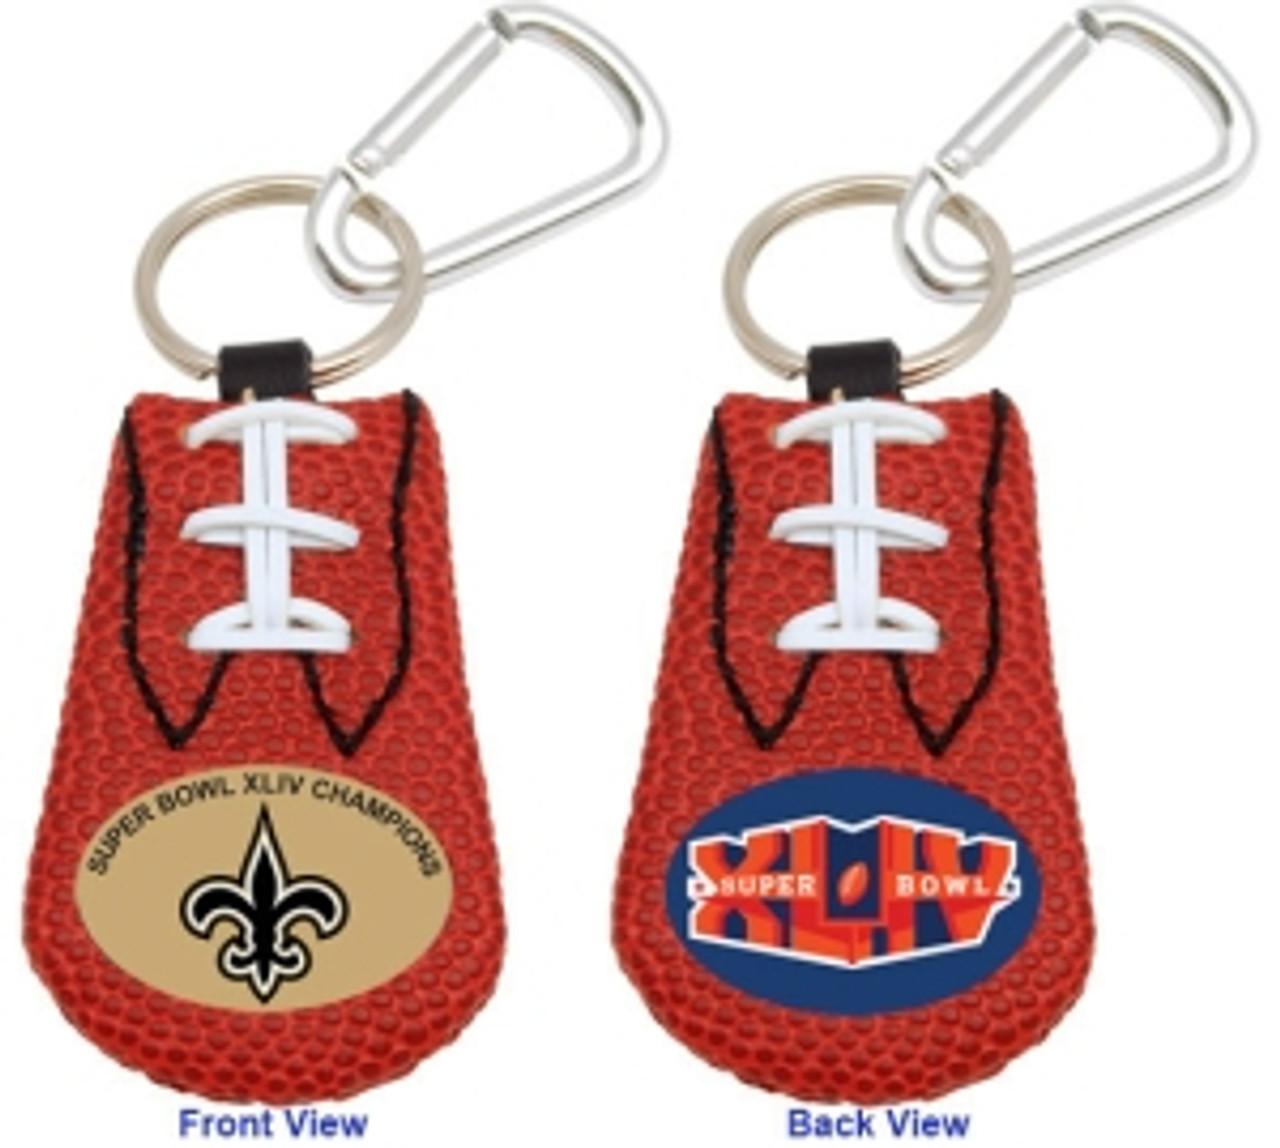 New Orleans Saints Football Keychain - Super Bowl 44 Champs